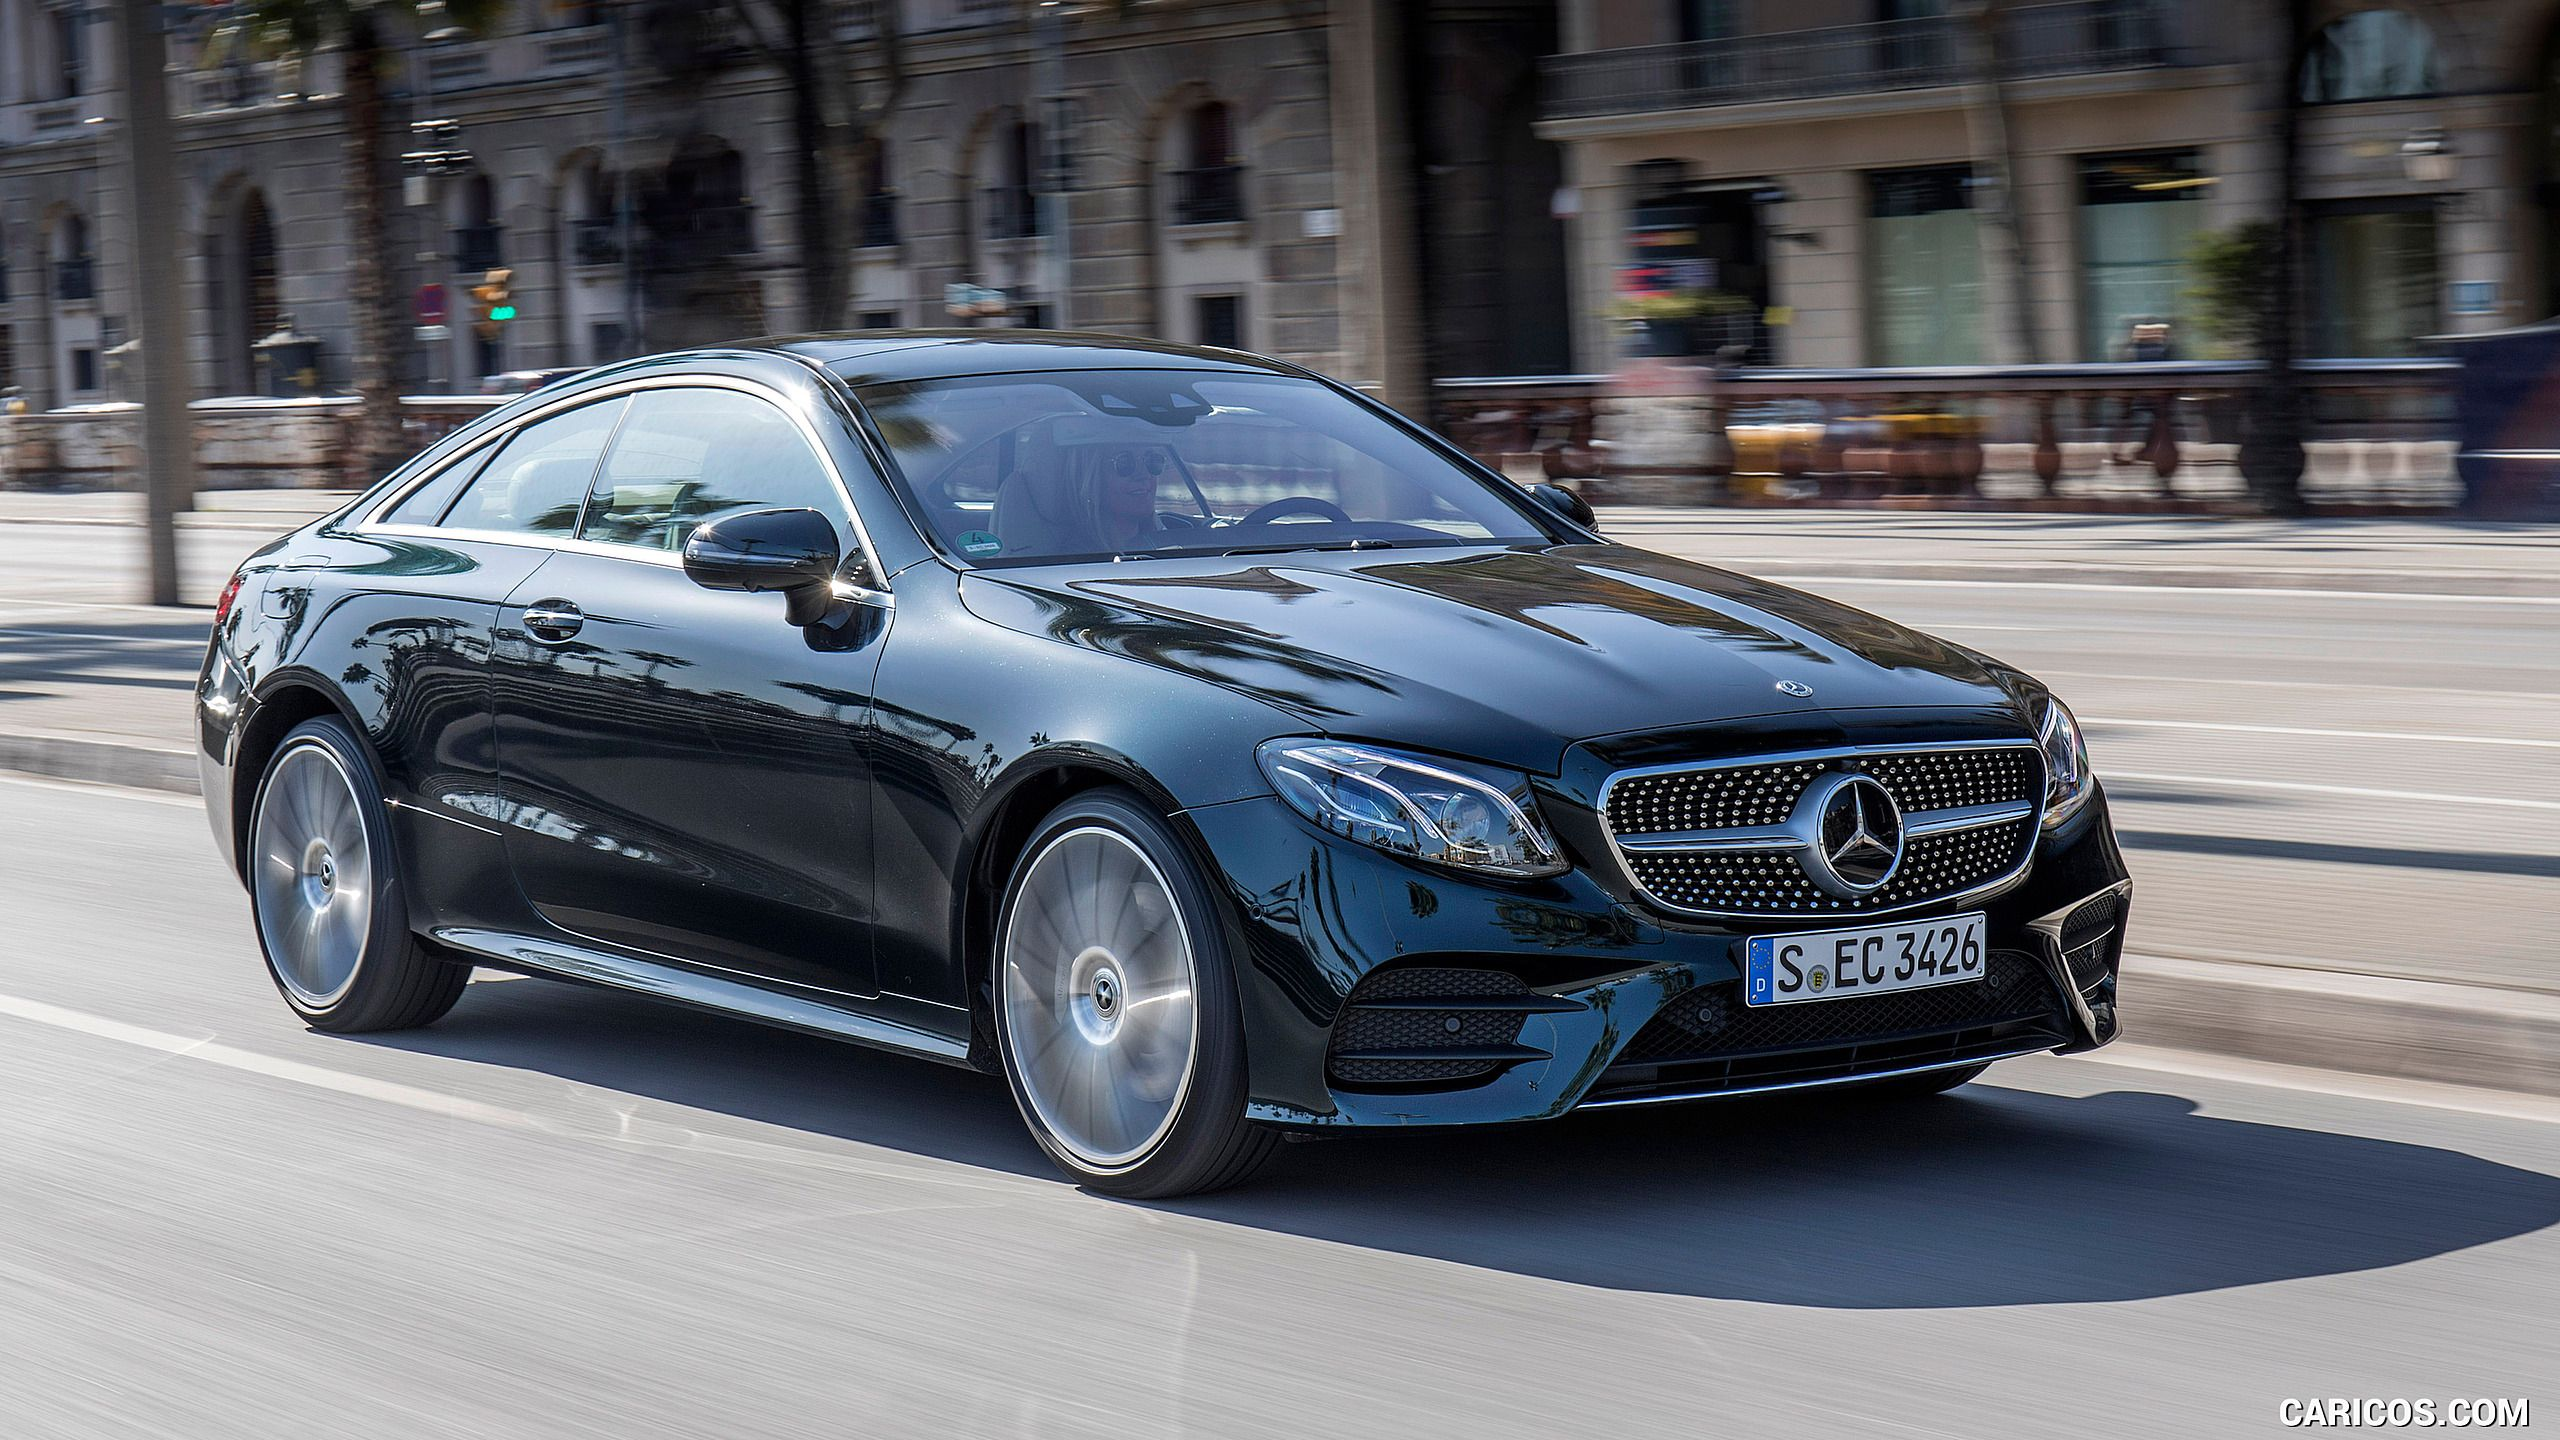 2018 Mercedes Benz E Class Coupe Wallpaper Mercedes Benz Benz Mercedes